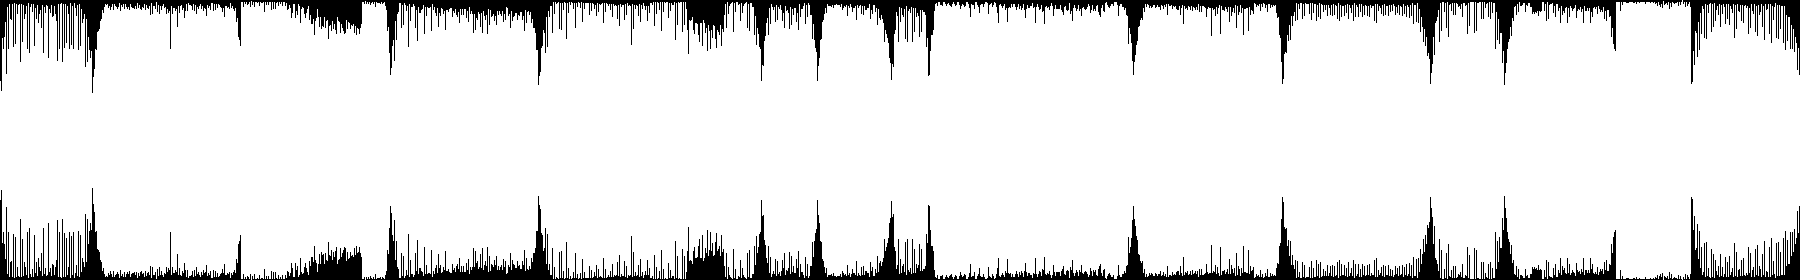 Riemann Techno Massive Presets 2 audio waveform